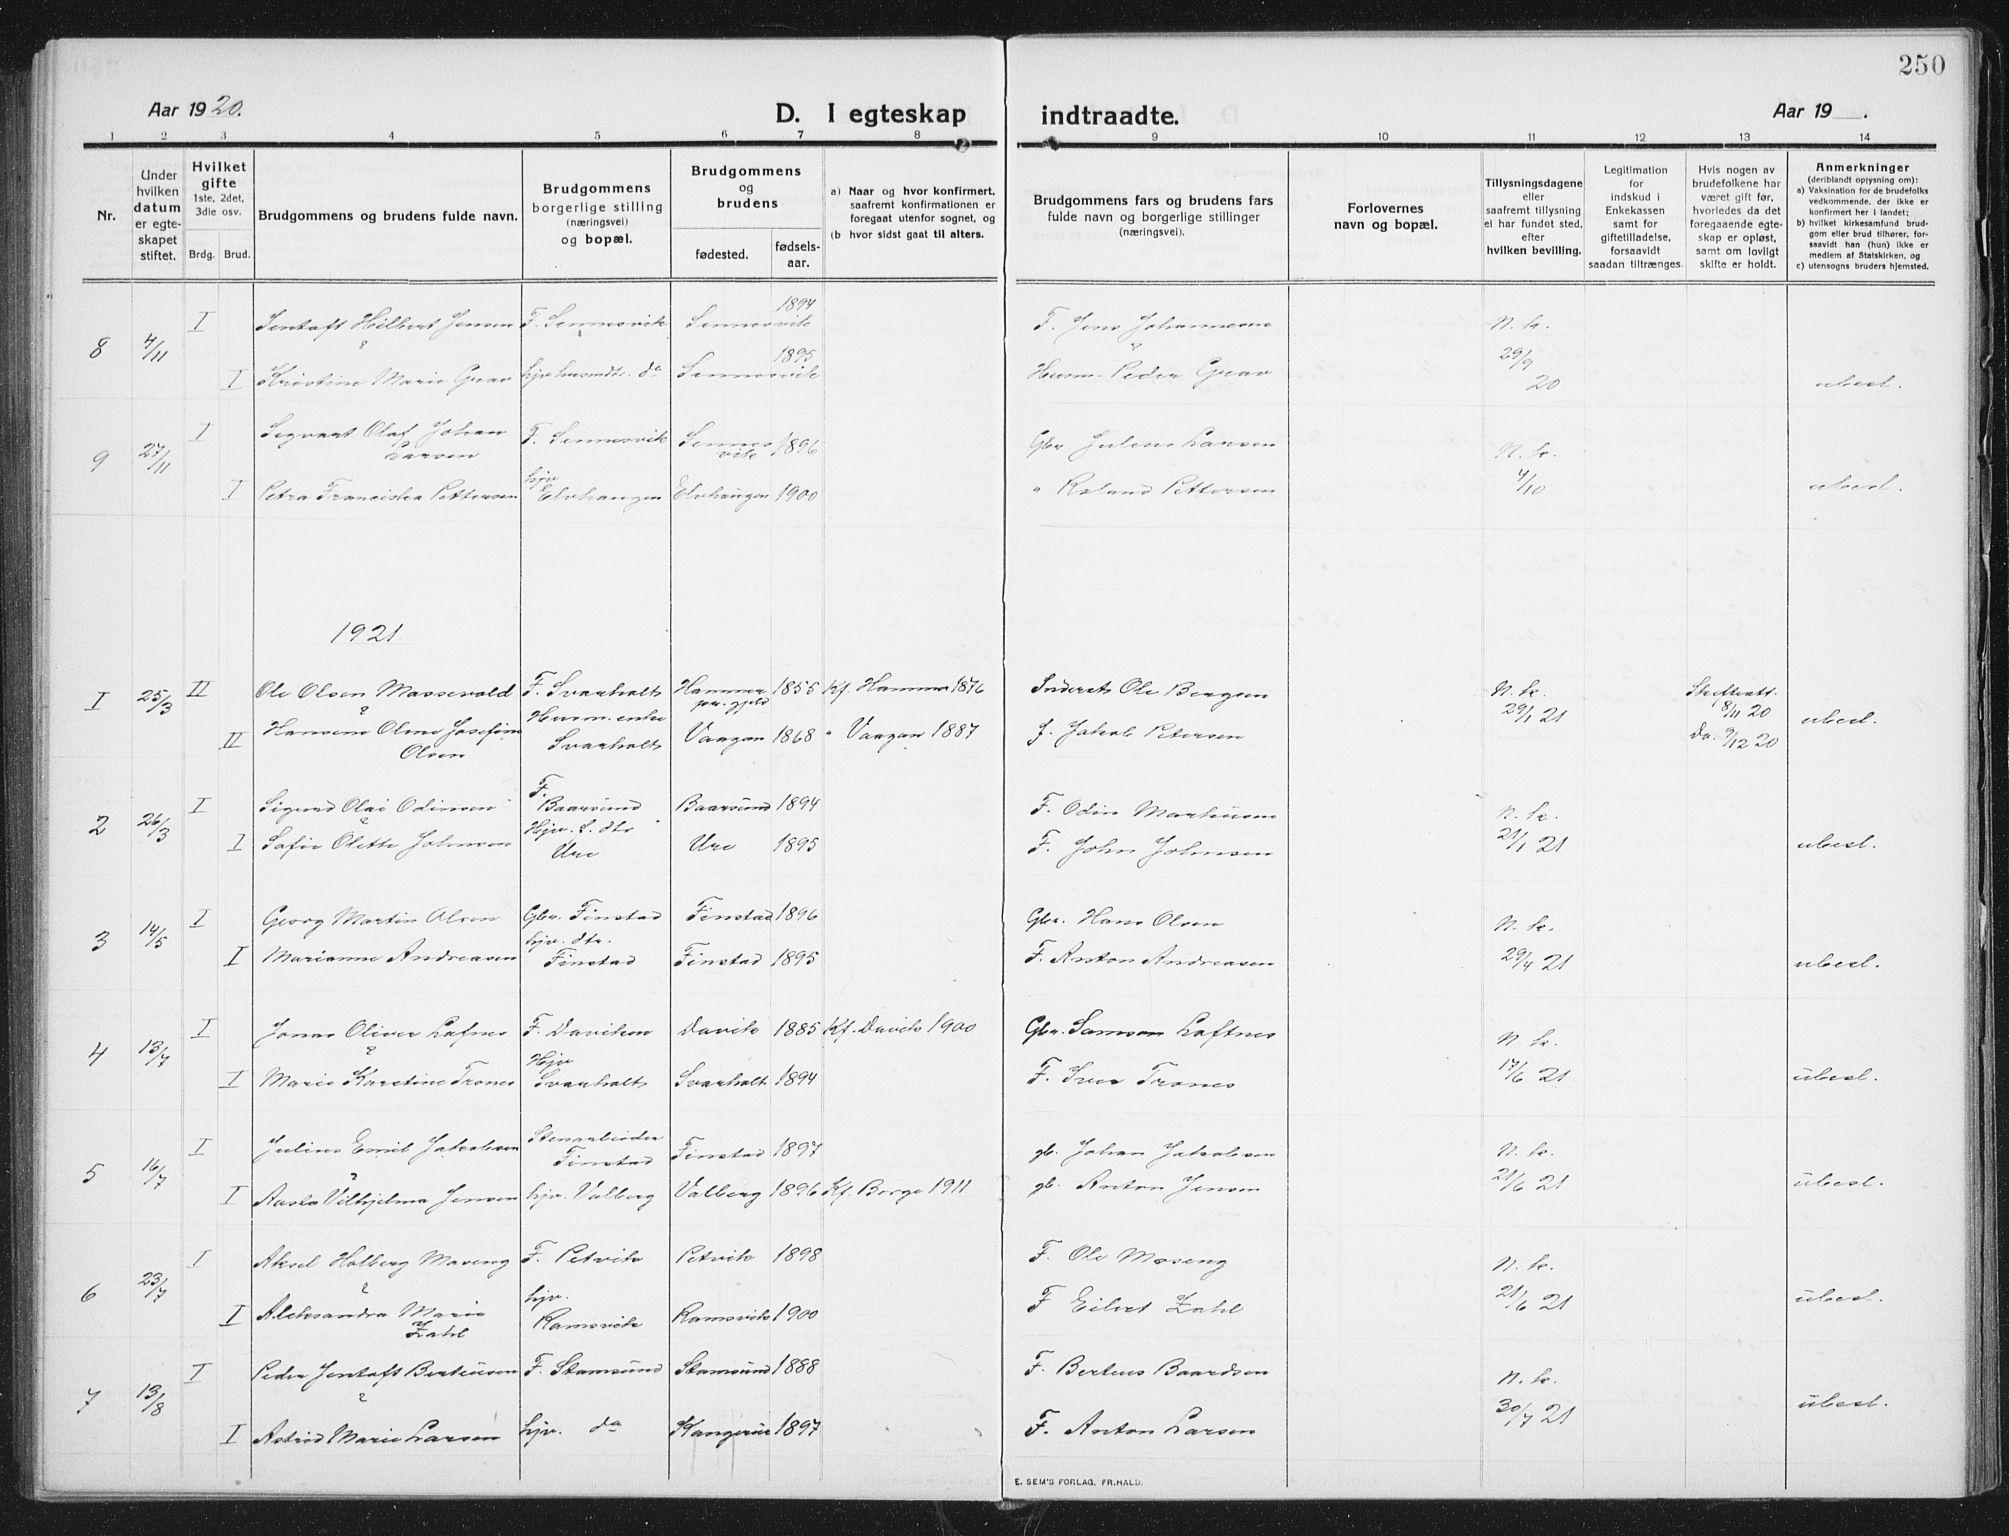 SAT, Ministerialprotokoller, klokkerbøker og fødselsregistre - Nordland, 882/L1183: Klokkerbok nr. 882C01, 1911-1938, s. 250